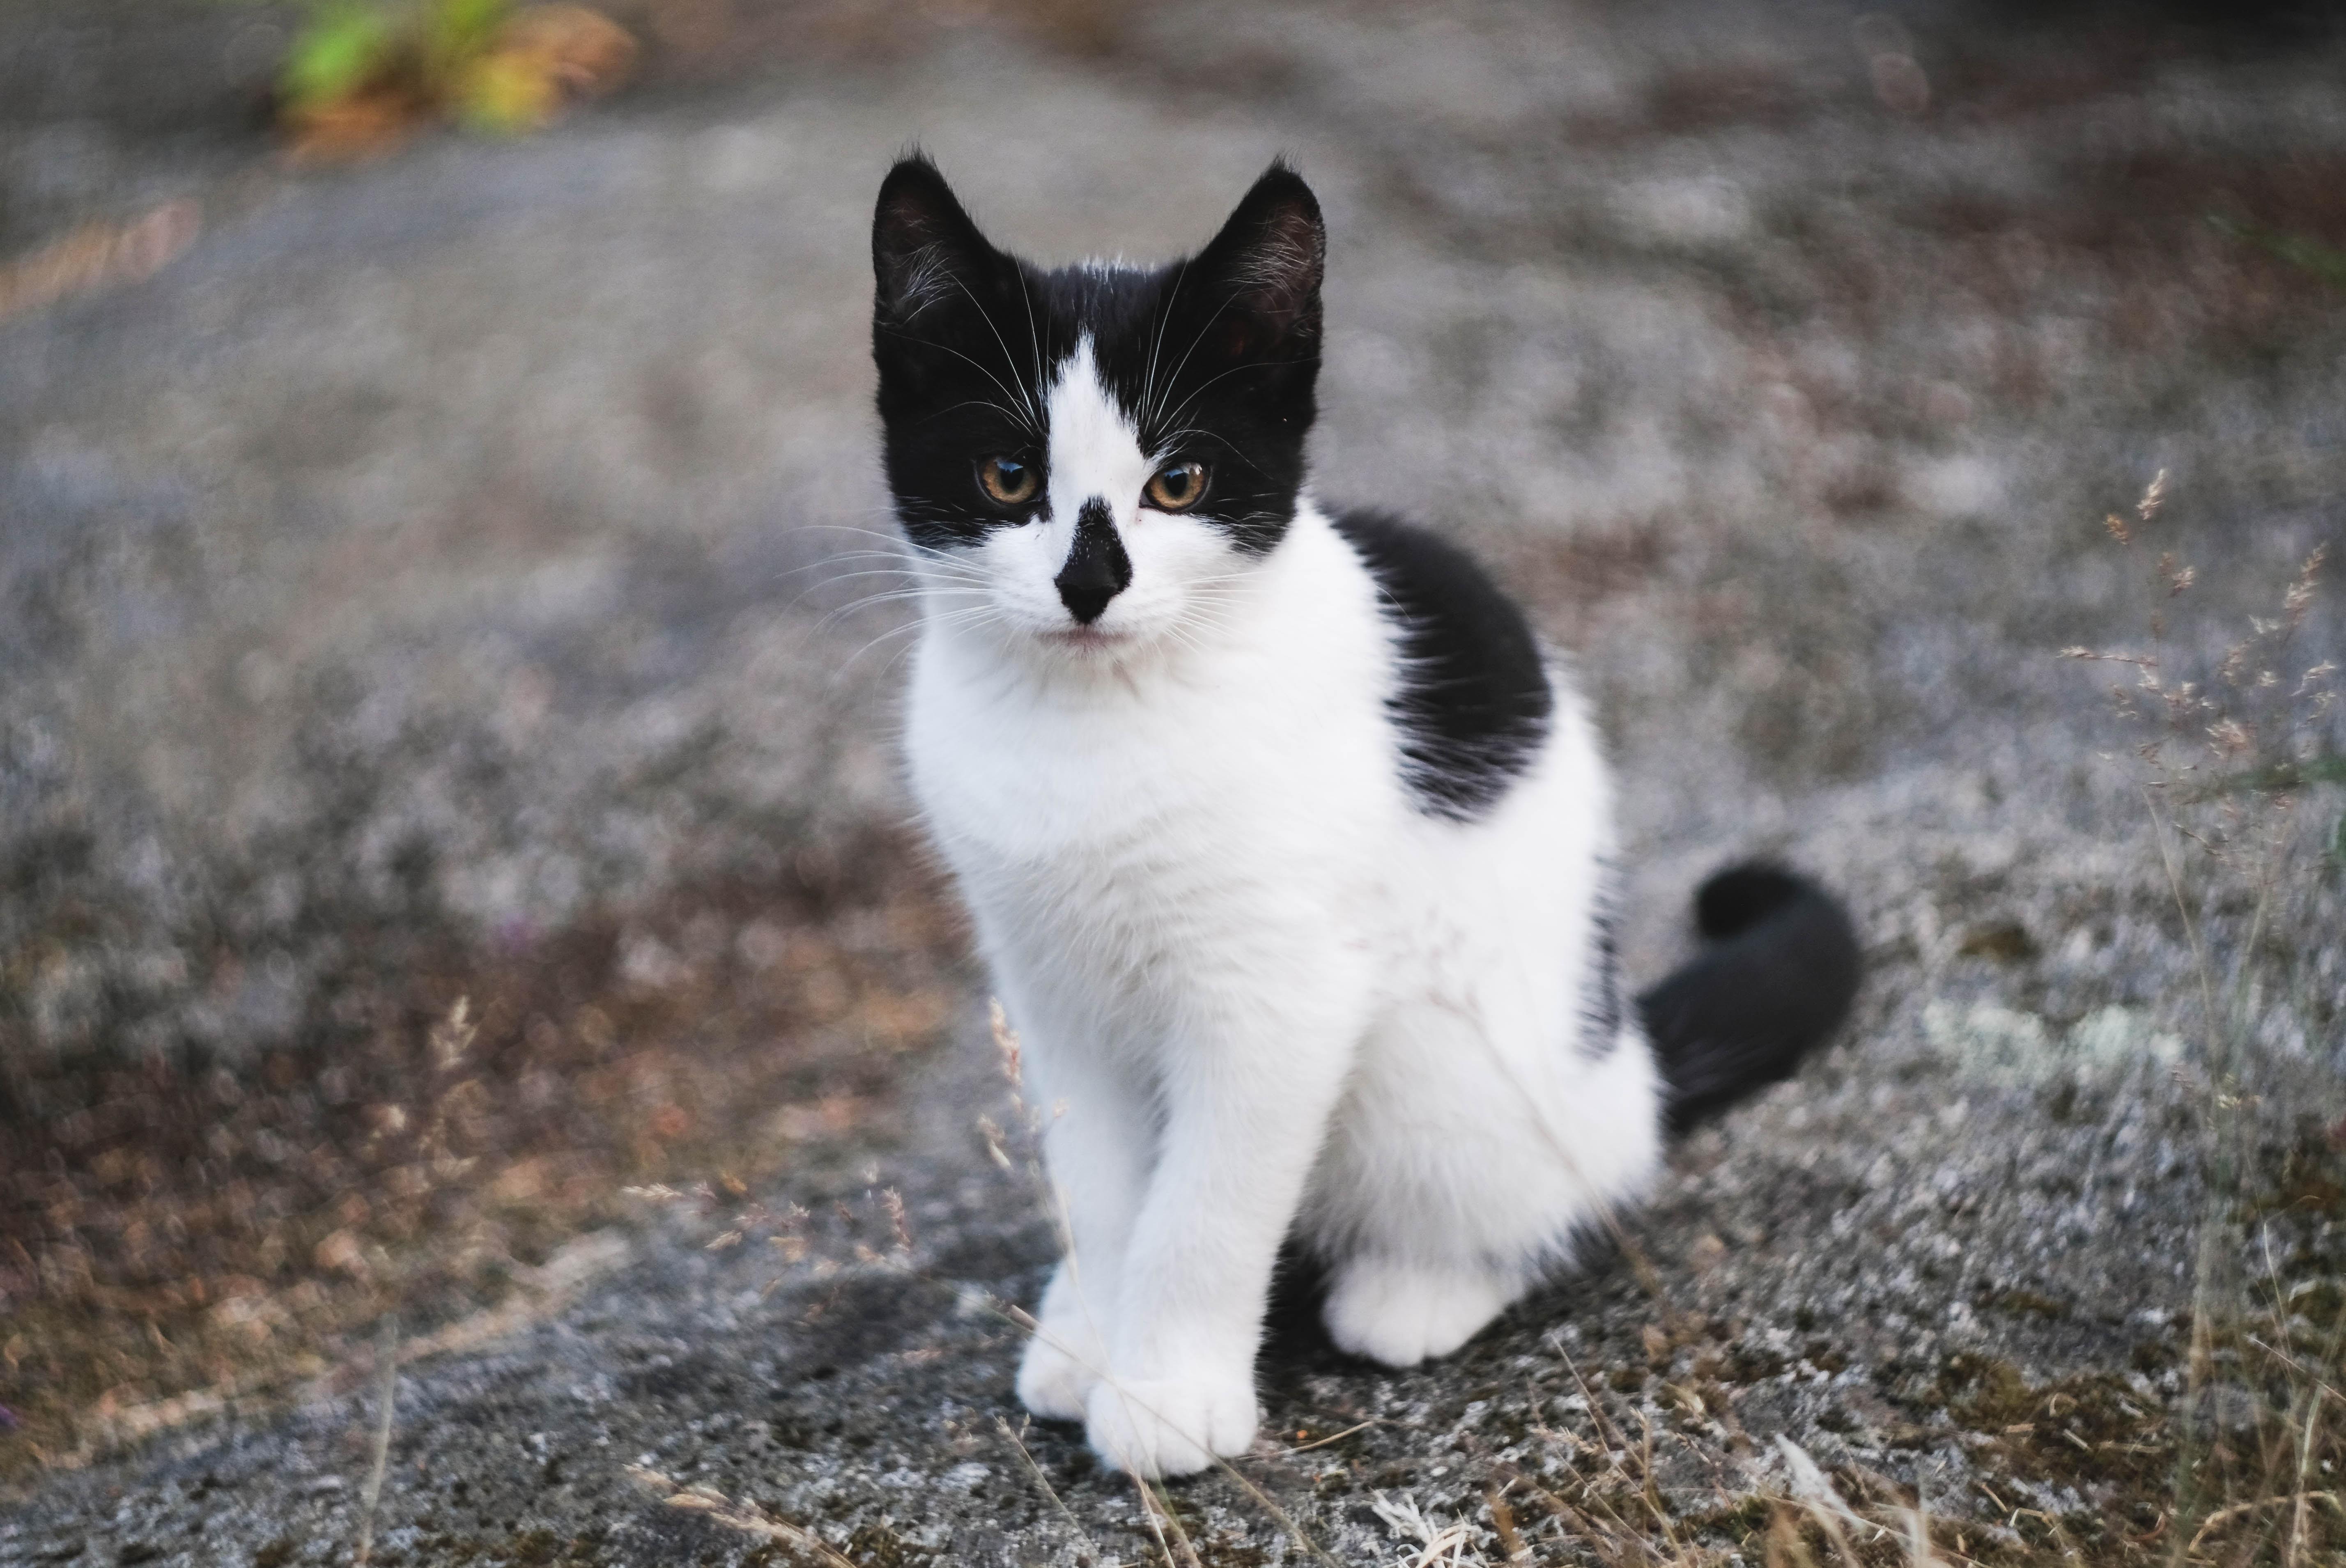 white and black cat on gray soil